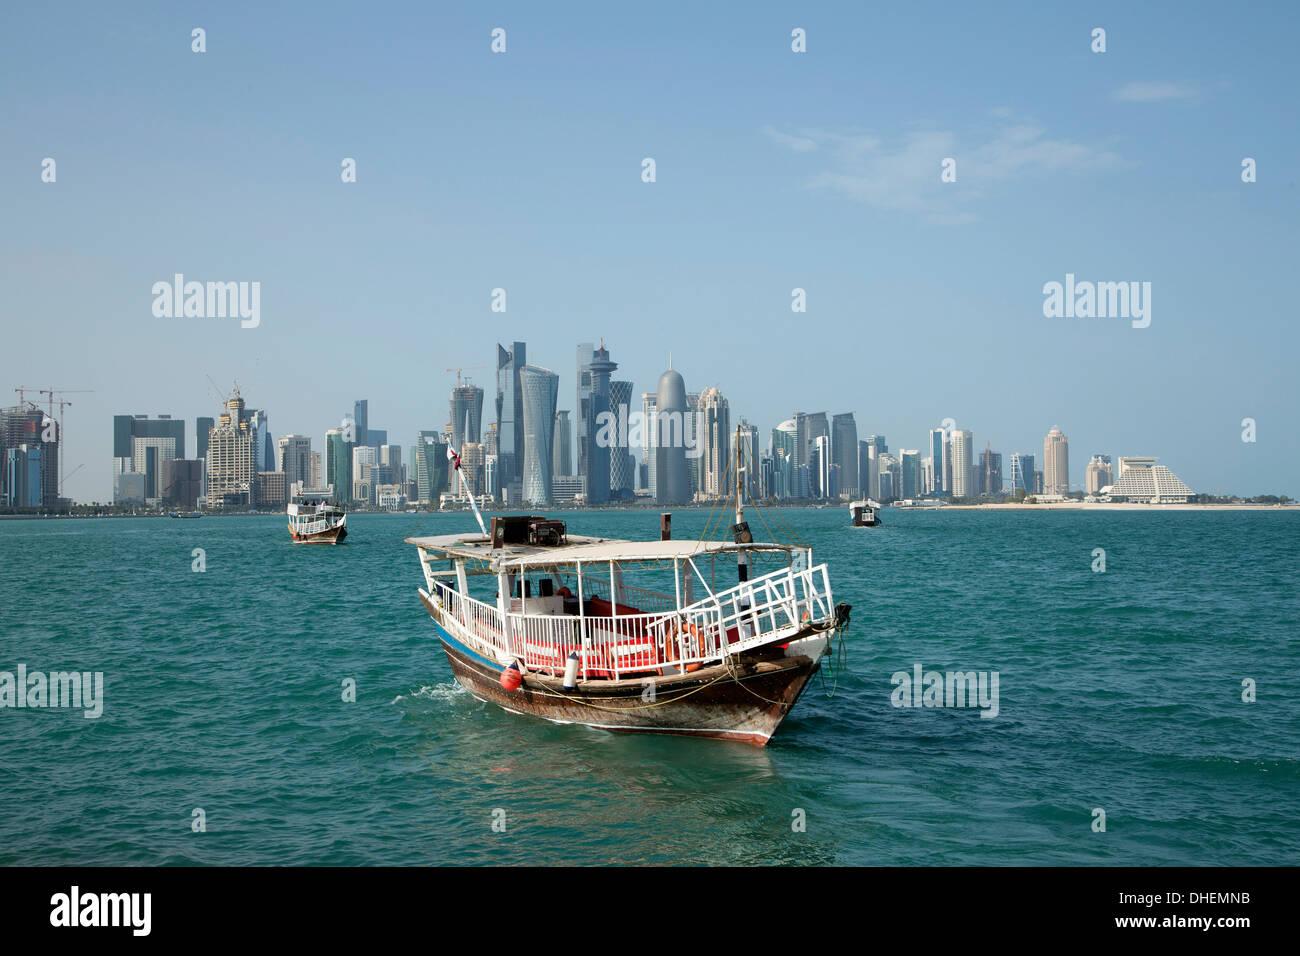 Futuristic skyscrapers in Doha, Qatar, Middle East - Stock Image